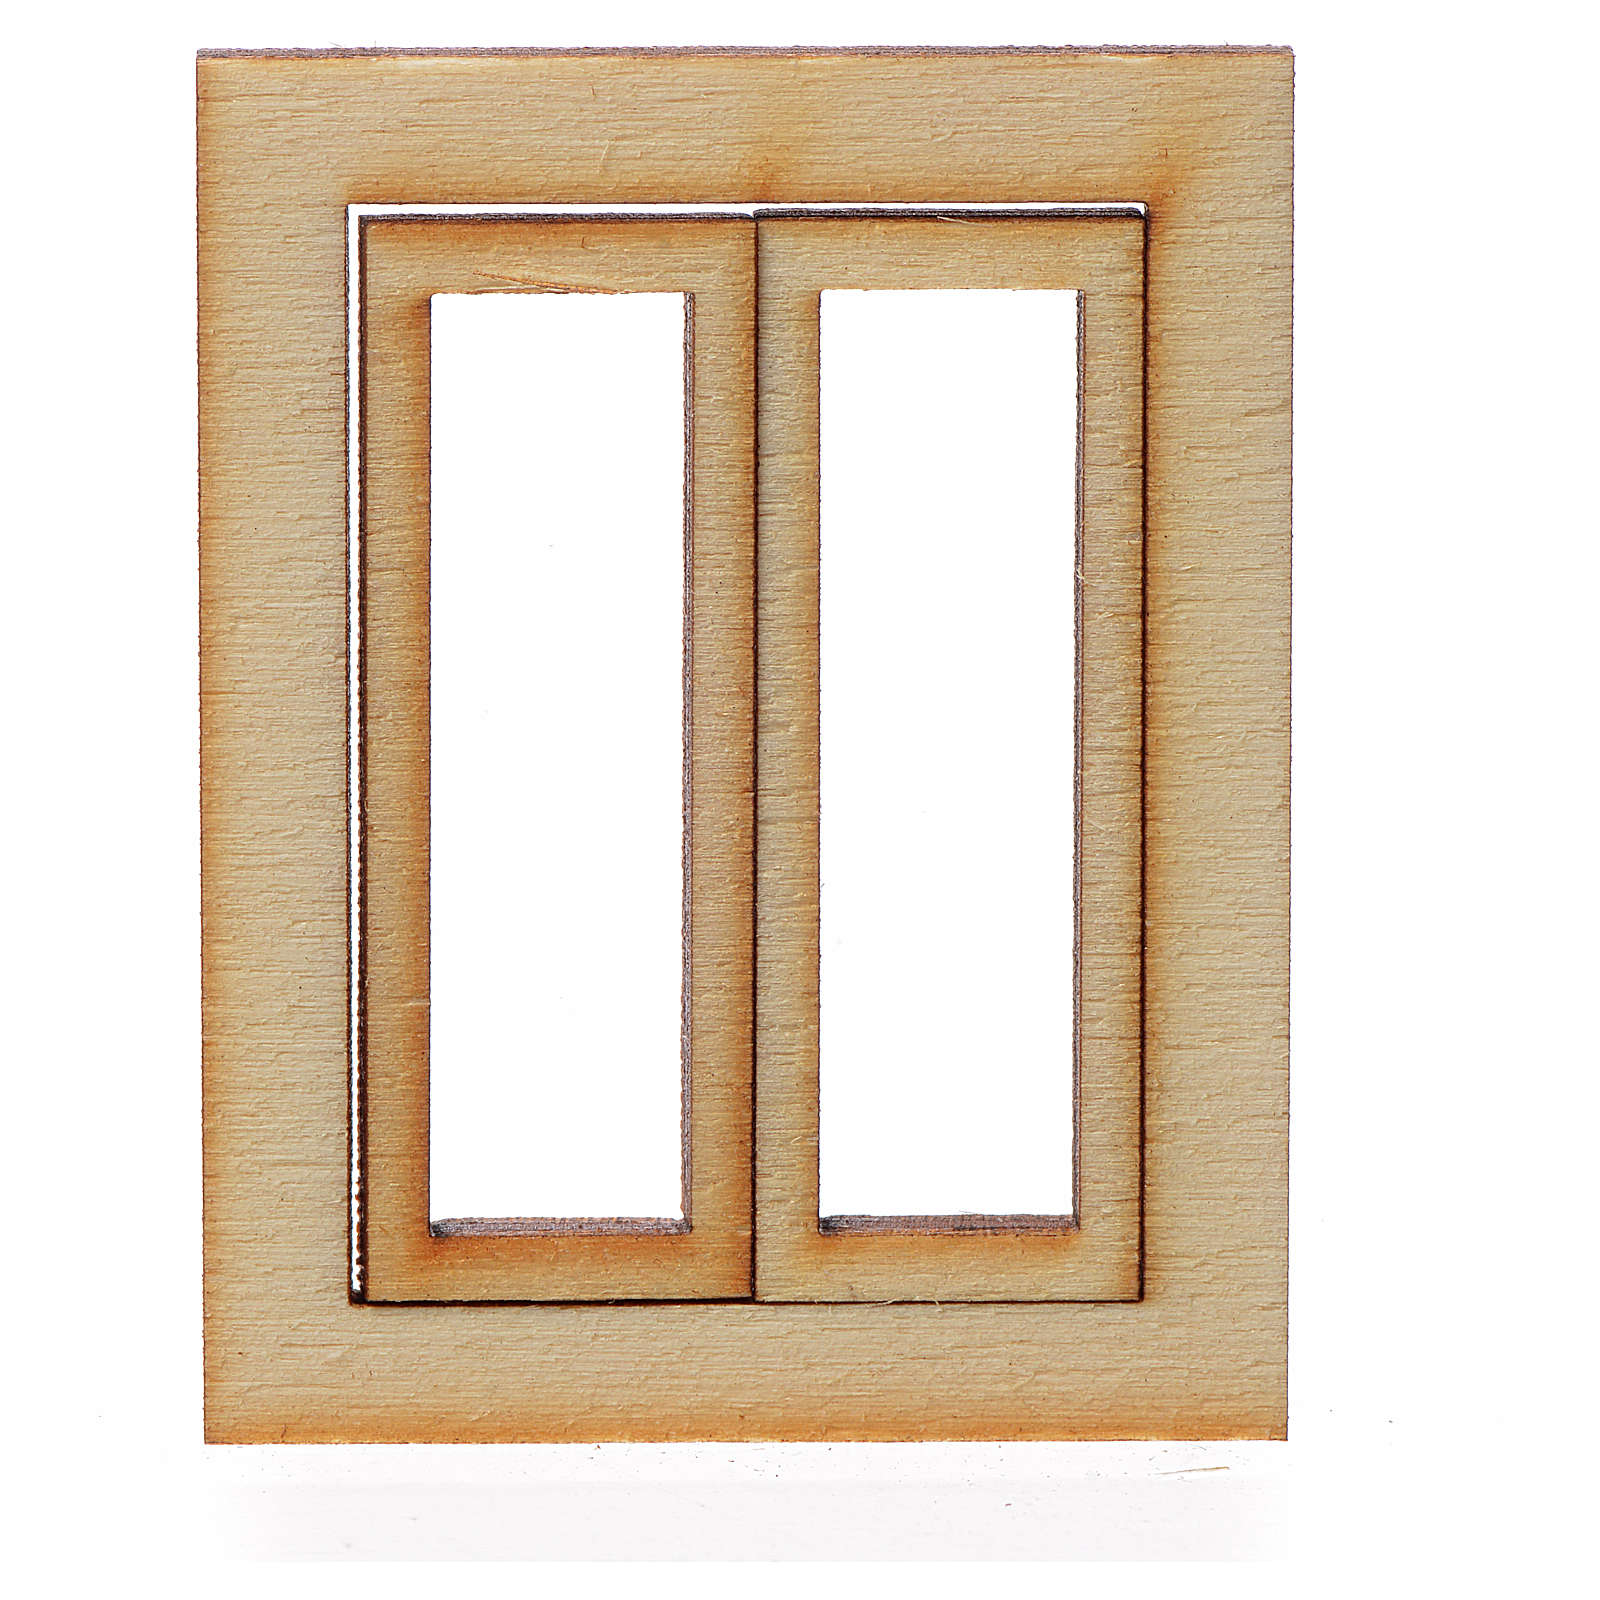 Infisso legno presepe 4,5x3,5 4